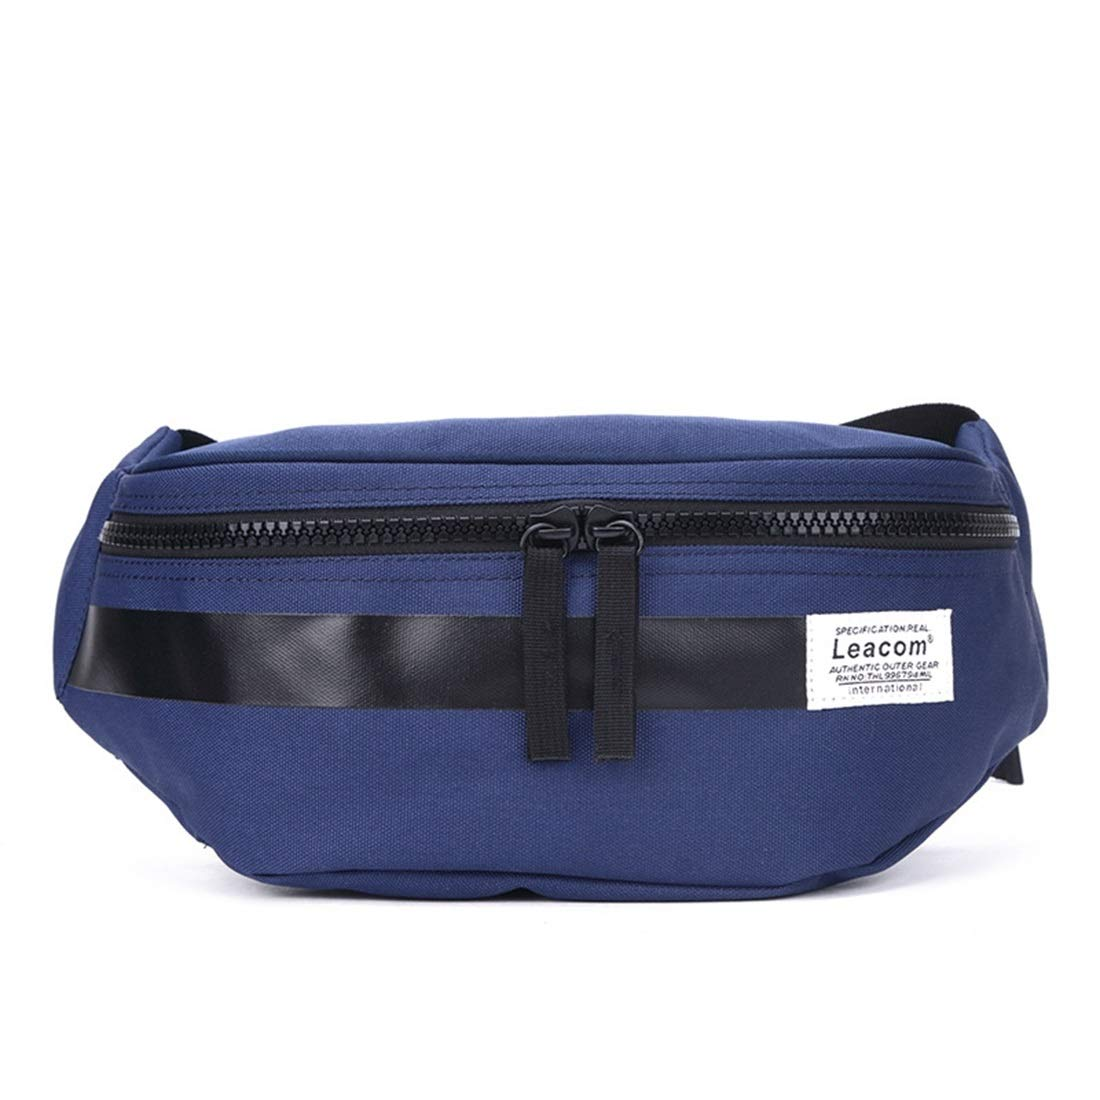 RABILTY Fanny Pack Black Waist Bag Travel Hiking Hip Bum Purse Blue Polyester Travel Money Belt RFID Blocking Color : Blue